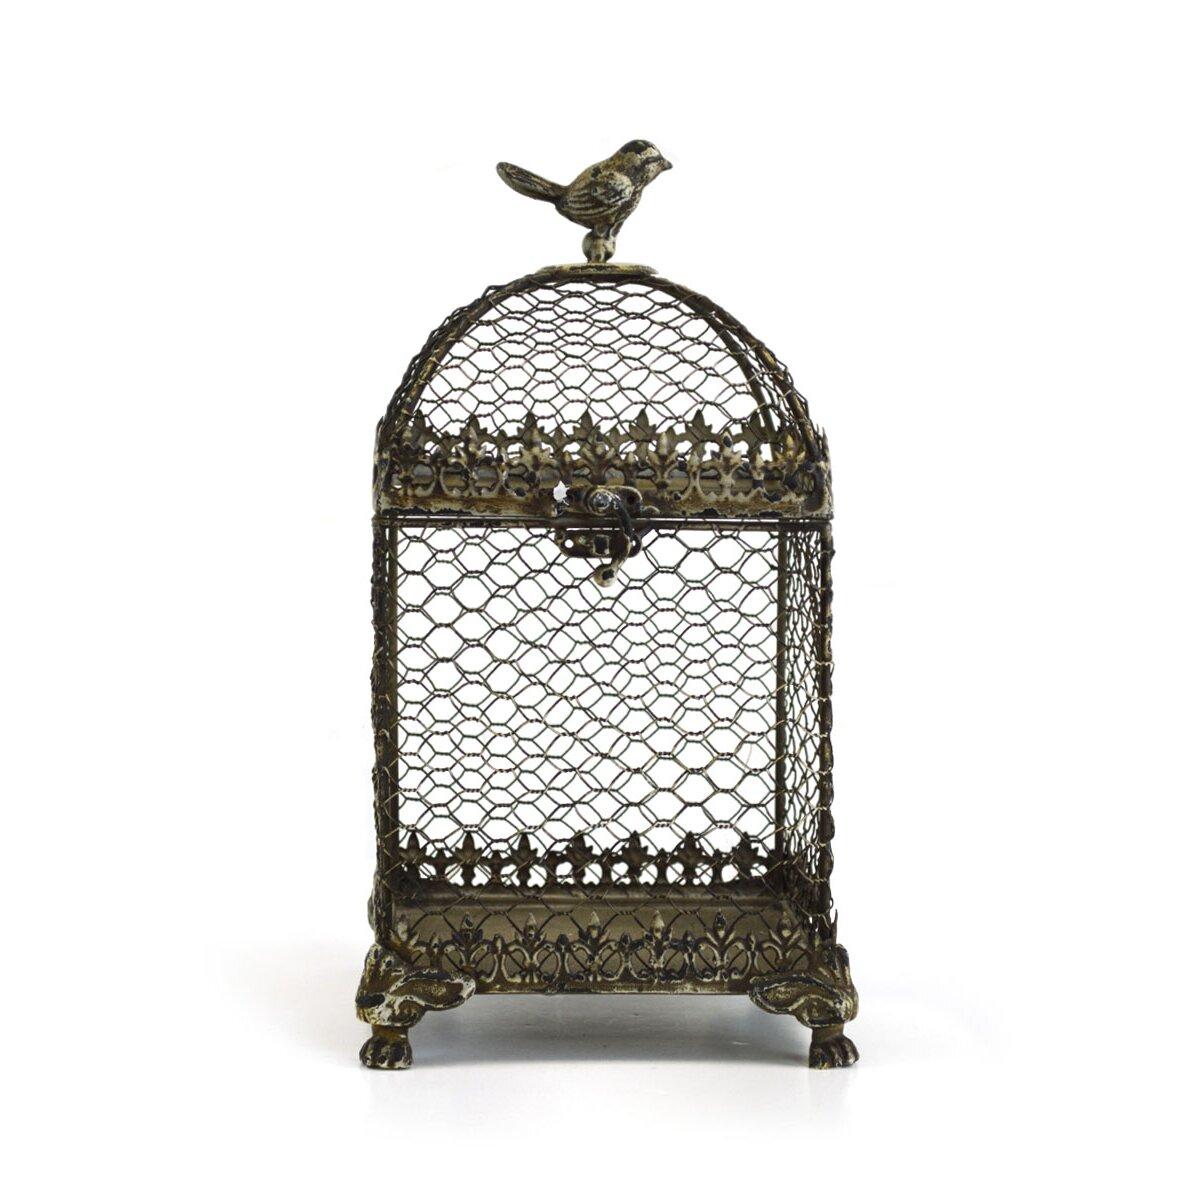 SheasWildflowers Decorative Vintage Metal Square Bird Cage & Reviews ...